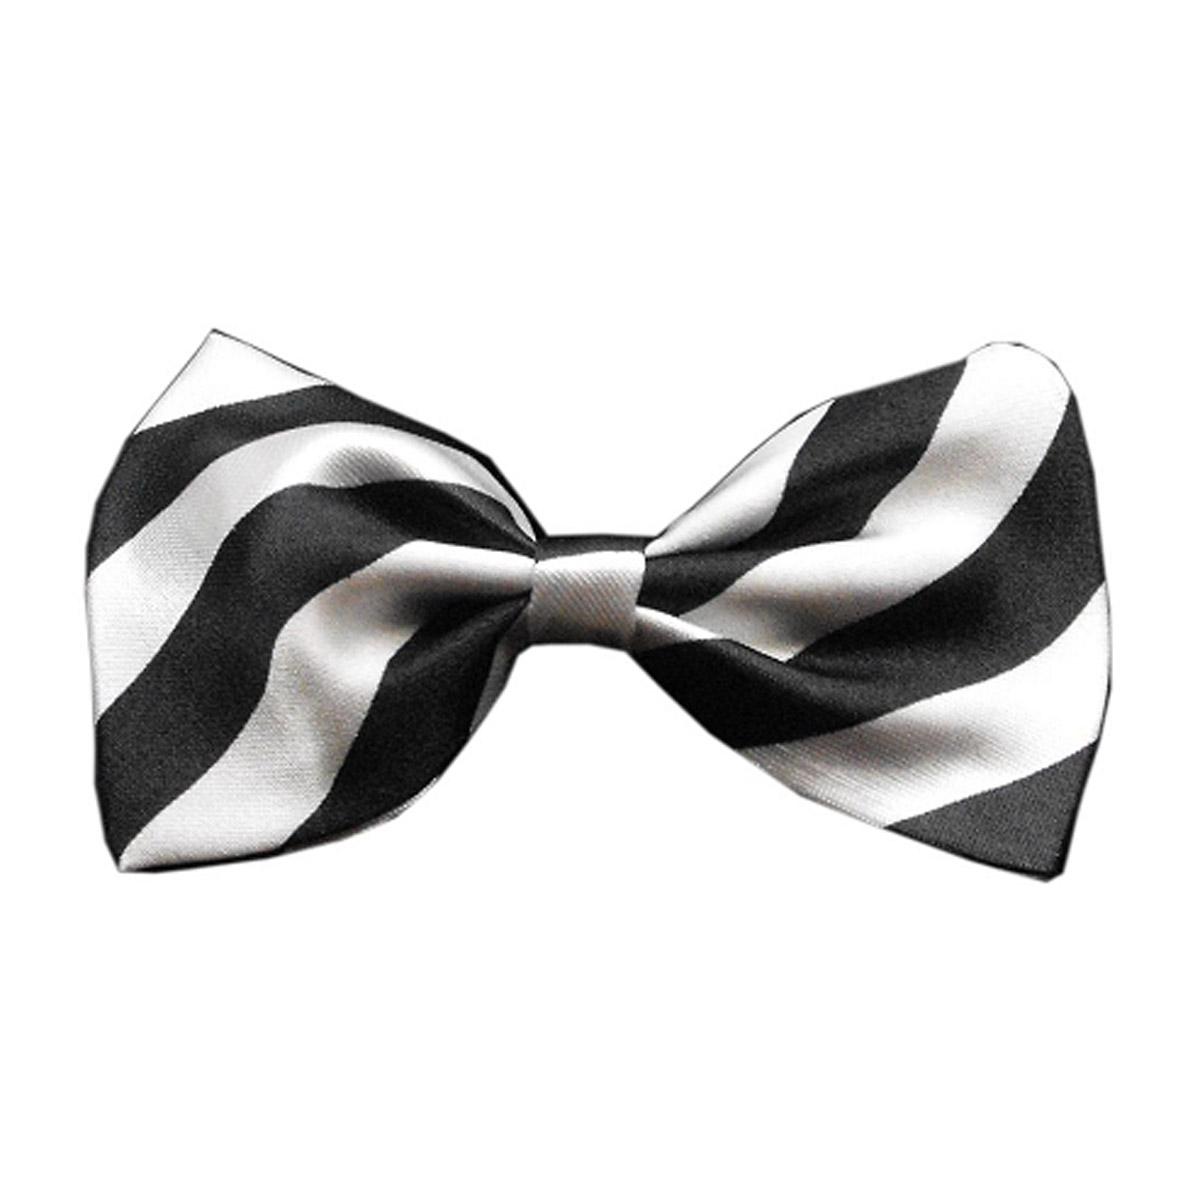 Striped Dog Bow Tie - White